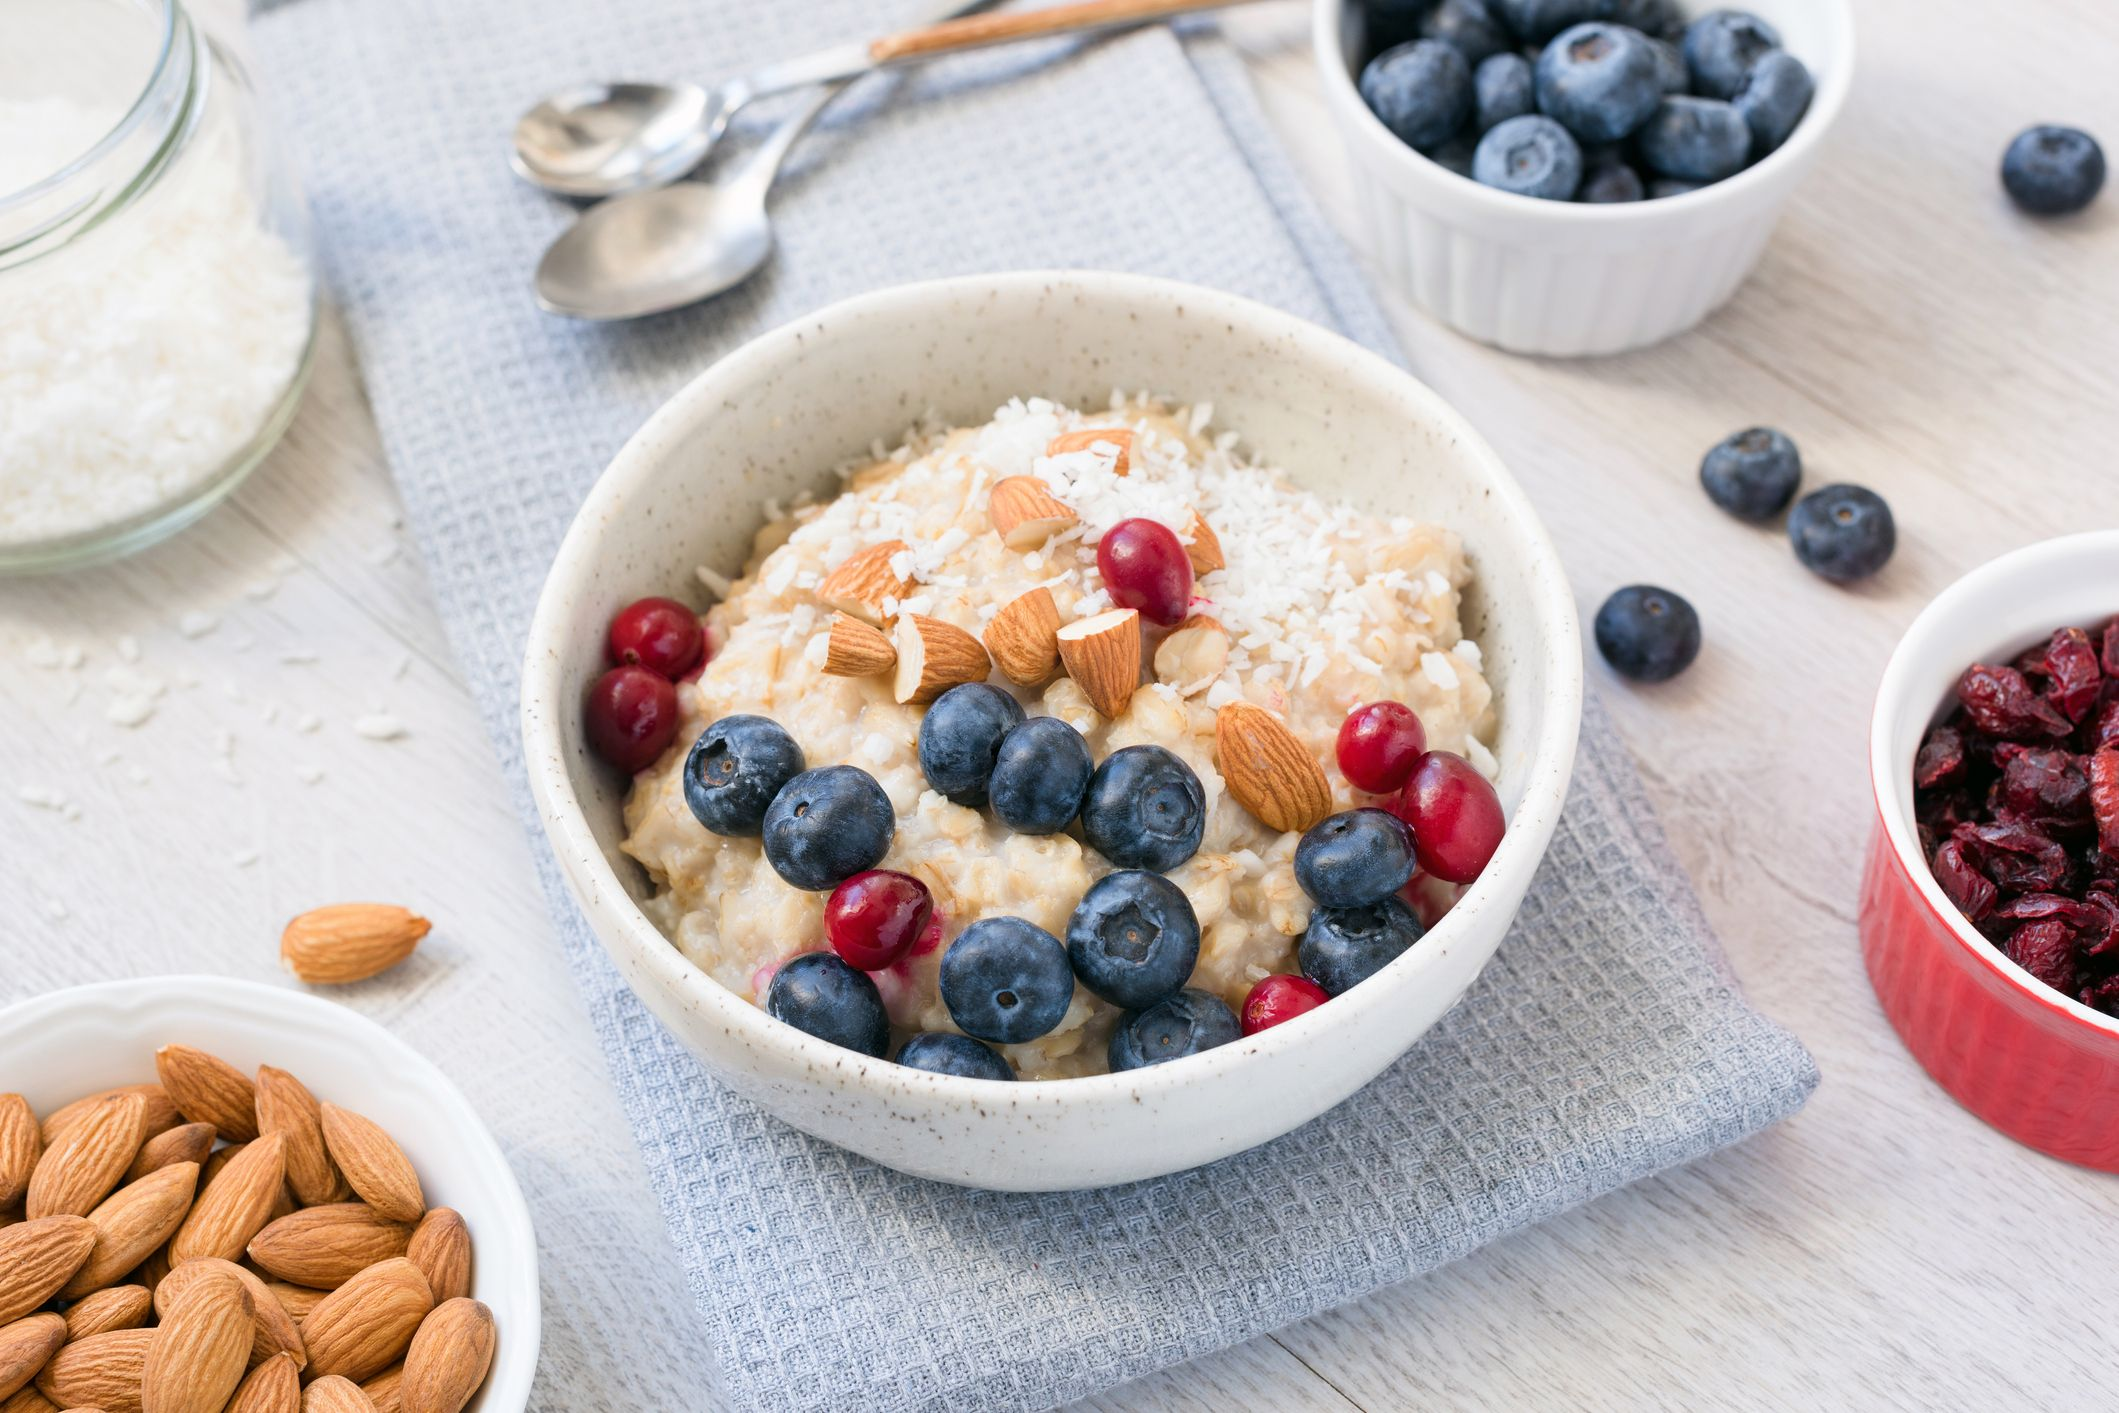 Oatmeal porridge bowl wtih blueberries, cranberries, almonds and coconut